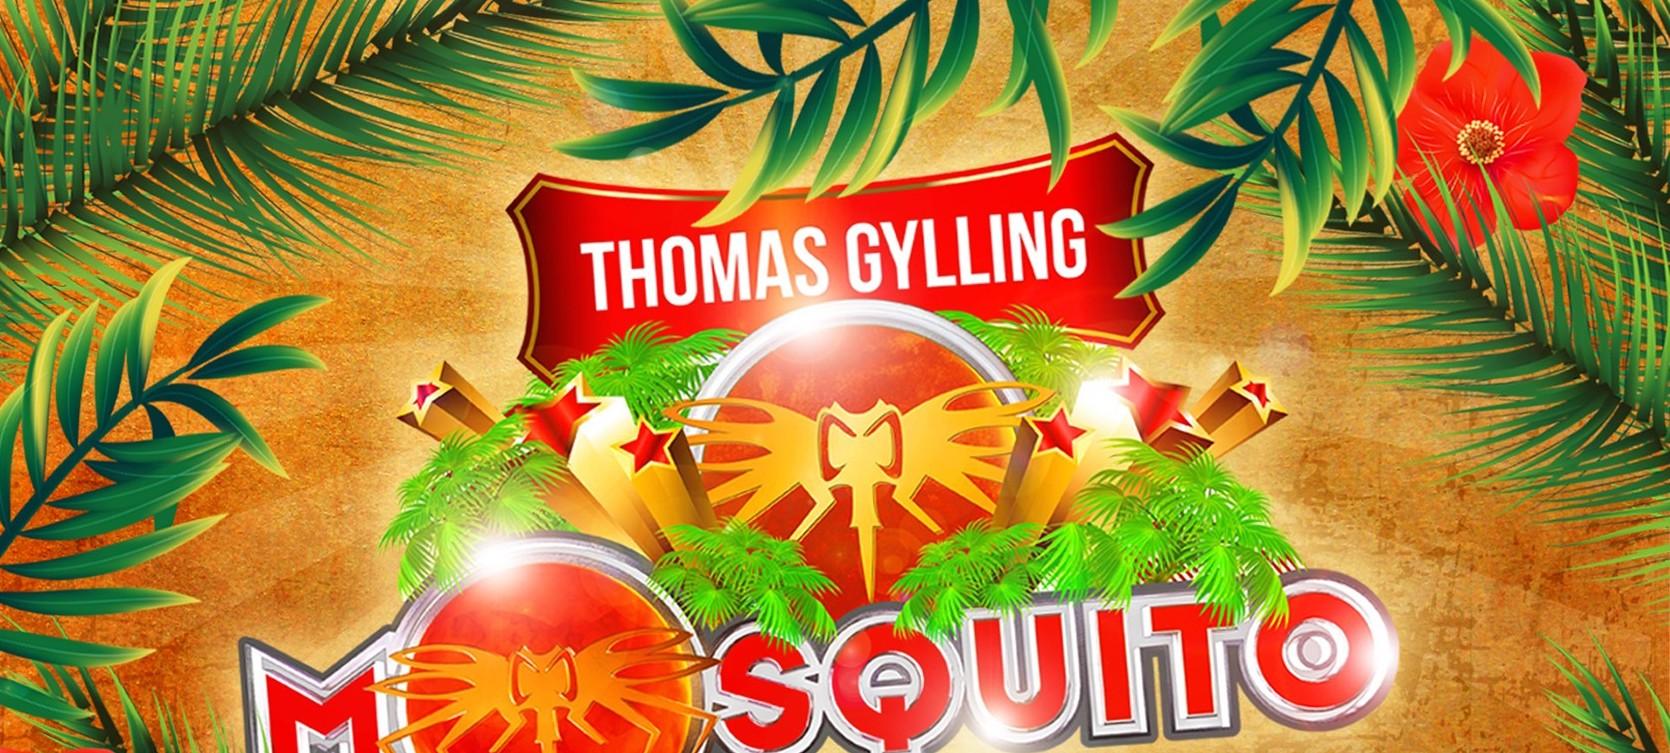 LIVESTREAMKLUBB: Klubb Mosquito live @thomasmosquito (Soca, afrobeats, dancehall, soukouss!)